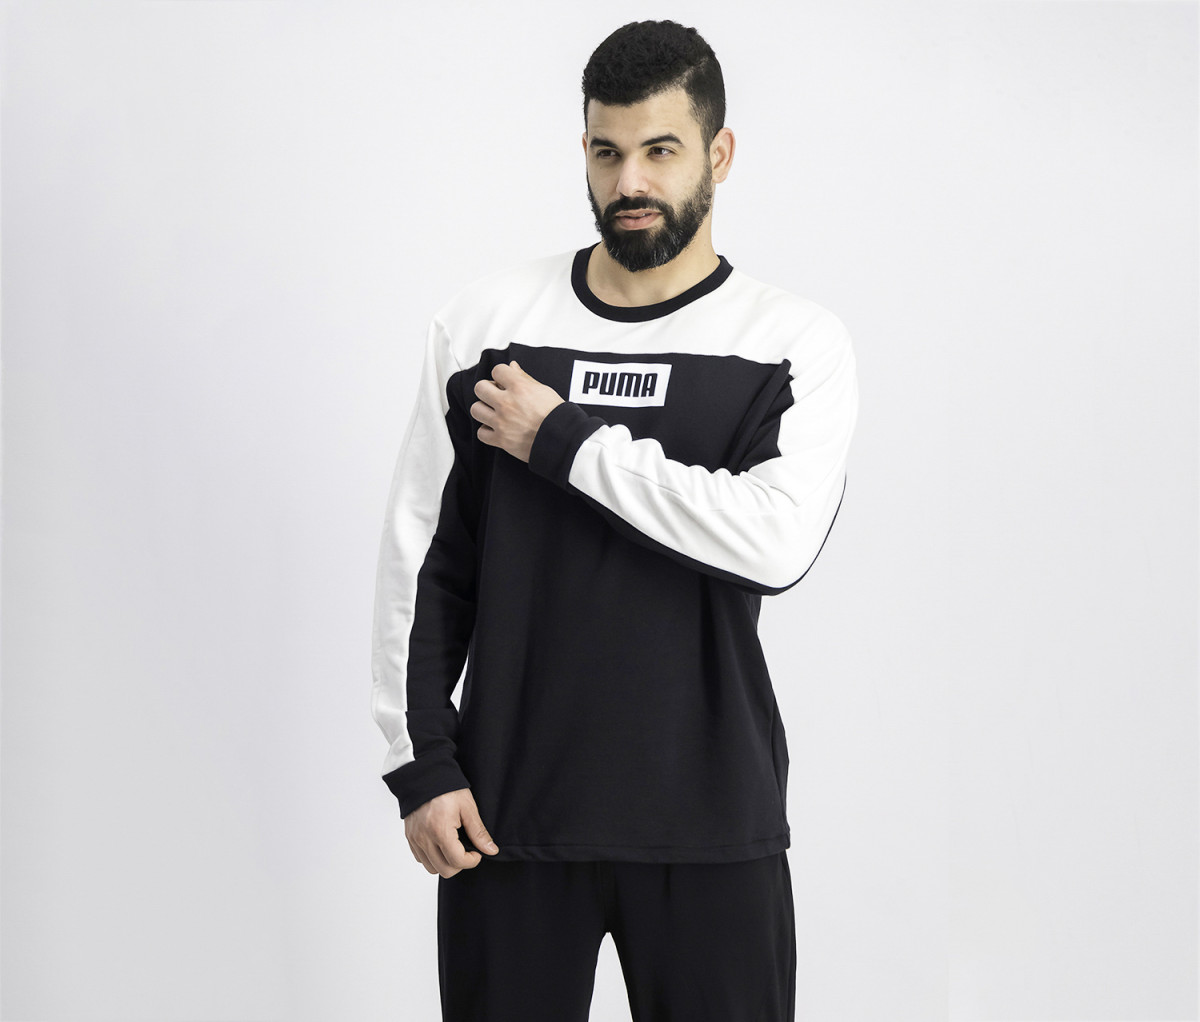 Puma Hummer Mens Training Knit Sweater  Black/White